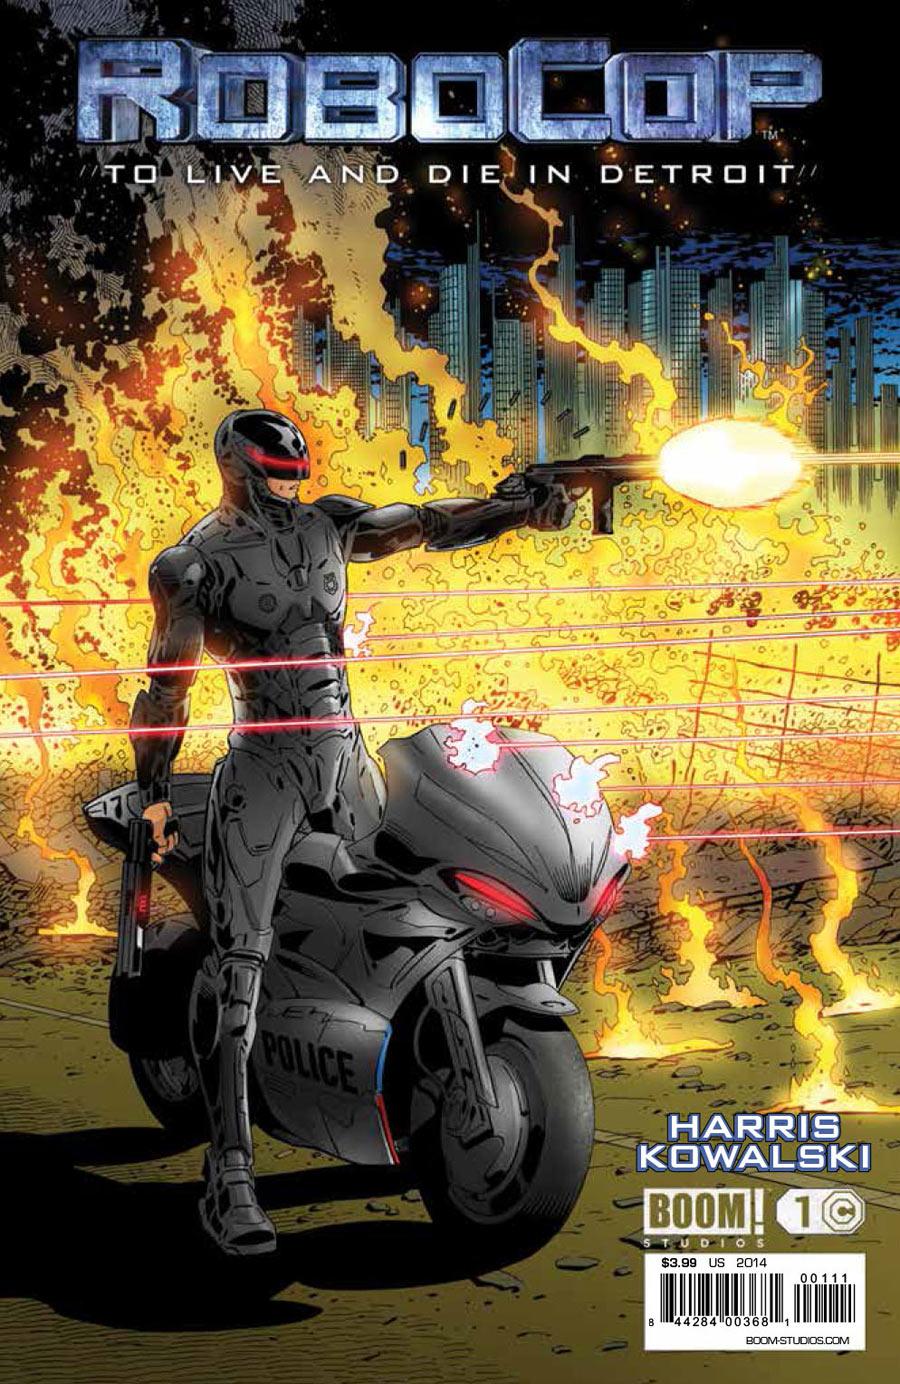 RoboCop-Live-and-Die-in-Detroit-rev-1-ca24d